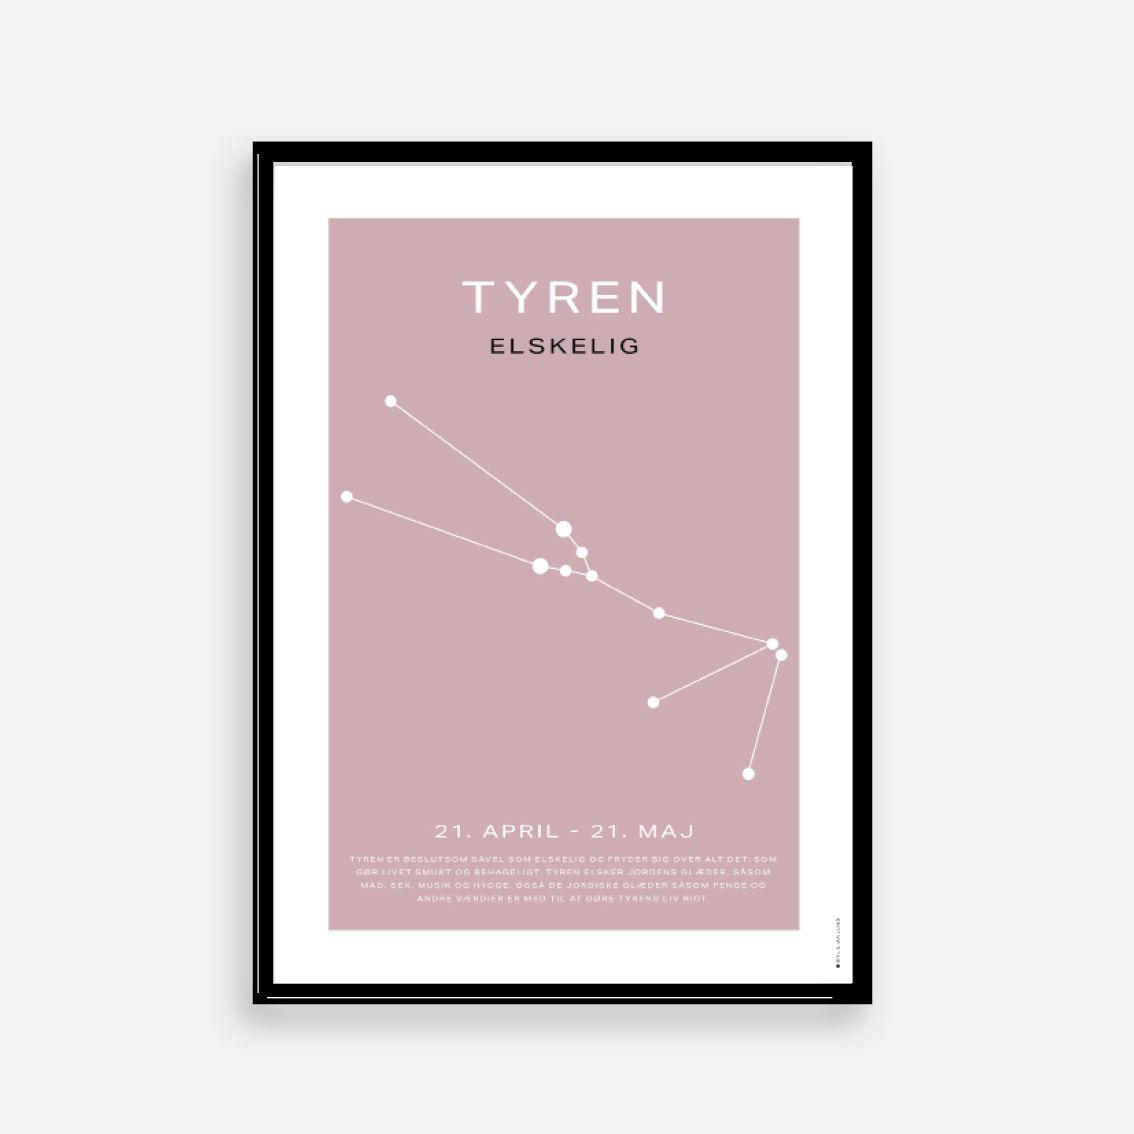 Stjernetegn Plakat Bylilianlund Stjernetegn Plakater Minimalistisk Plakat